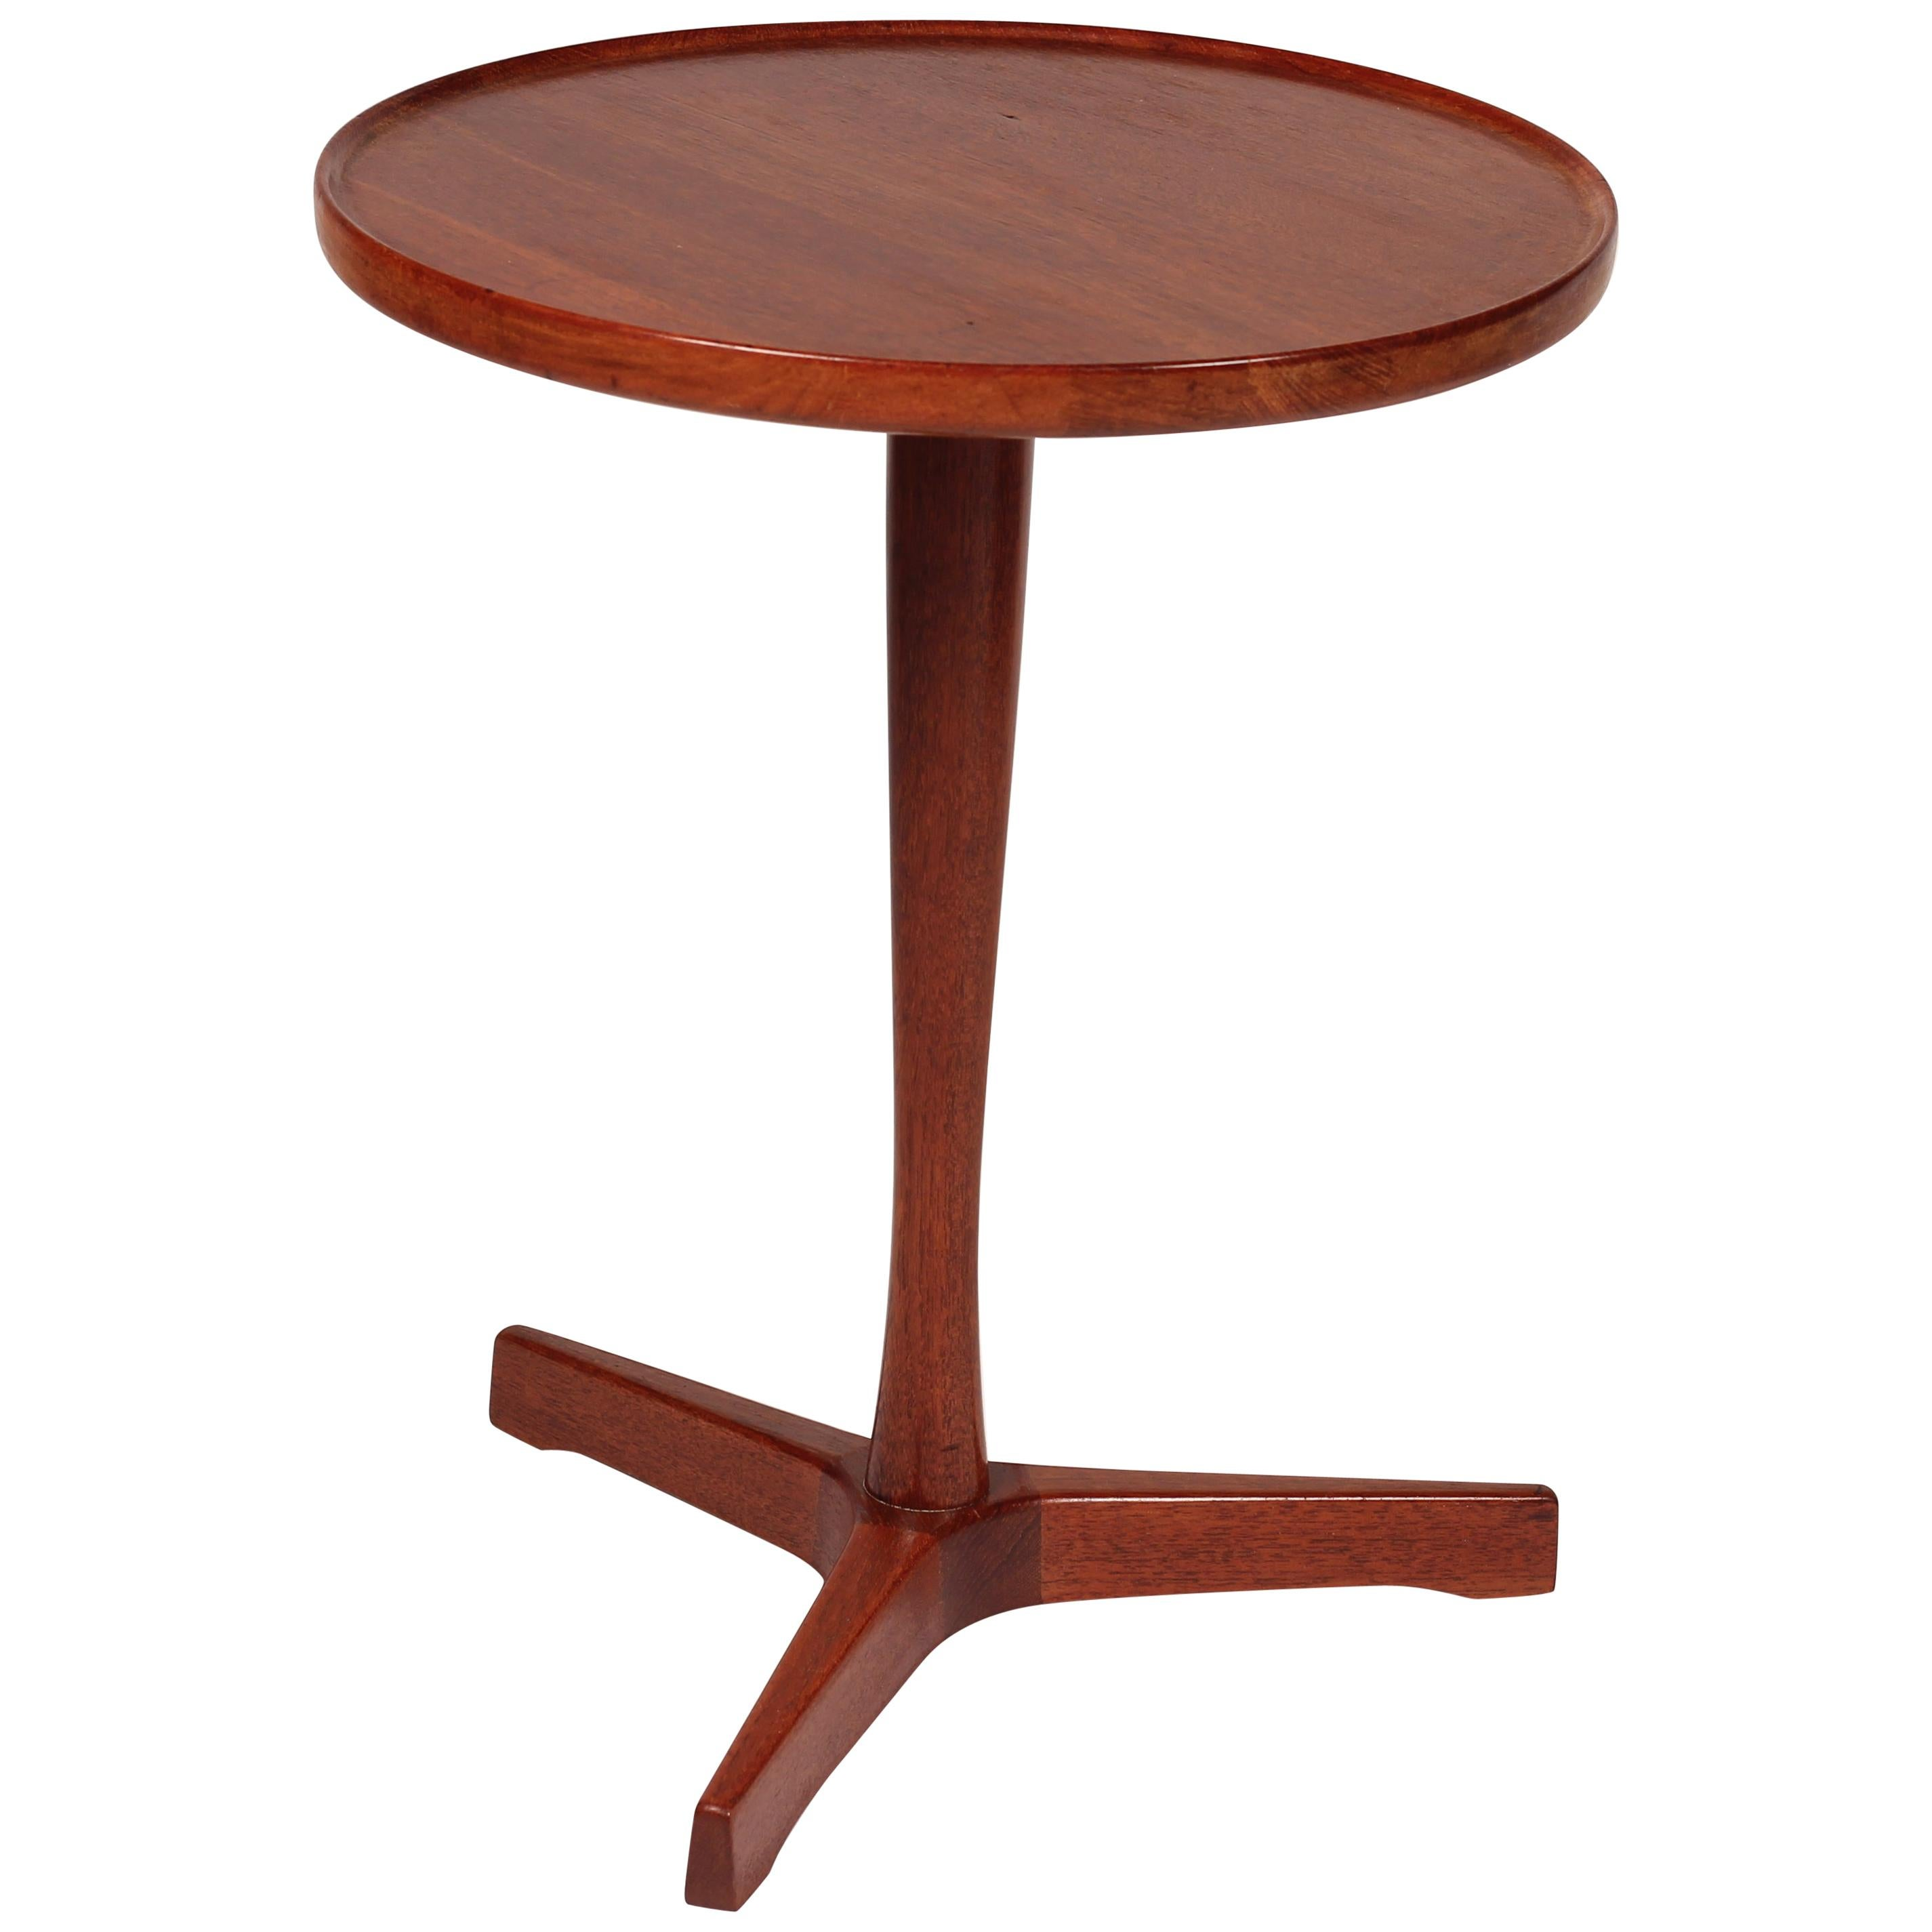 Midcentury Danish Teak Side Table Designed by Hans C Andersen